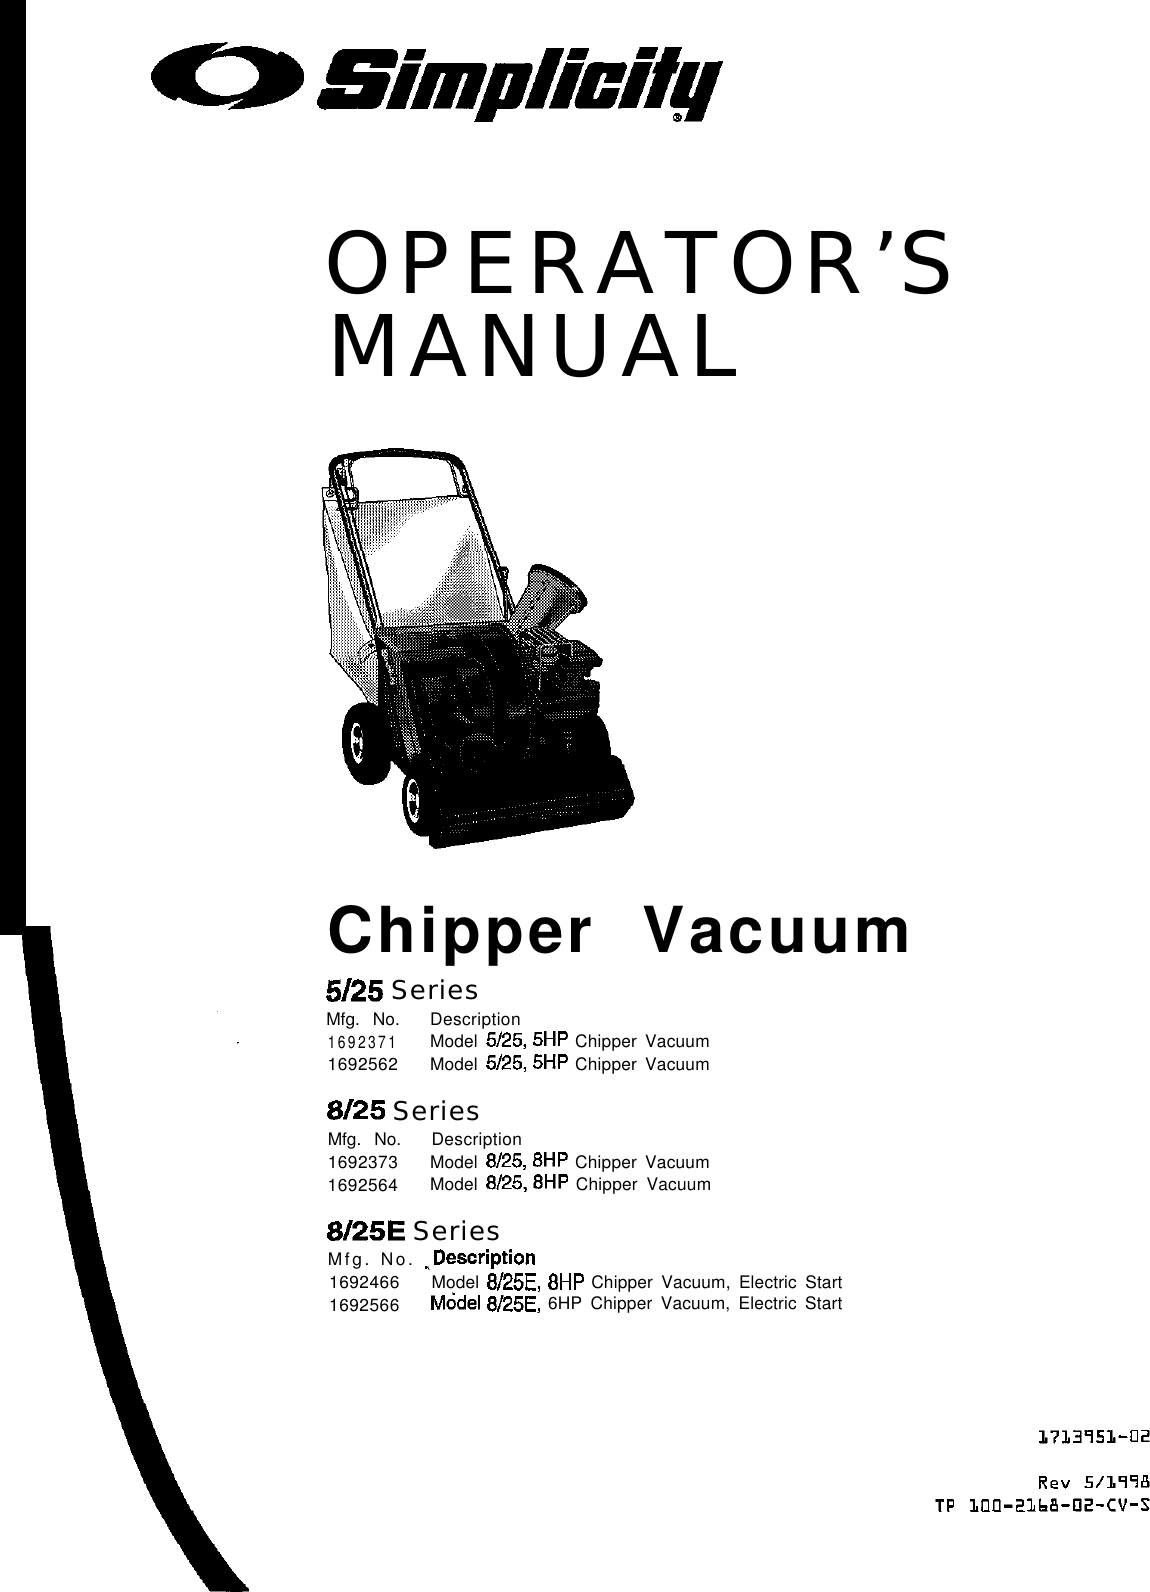 Simplicity 41815 Operators Manual